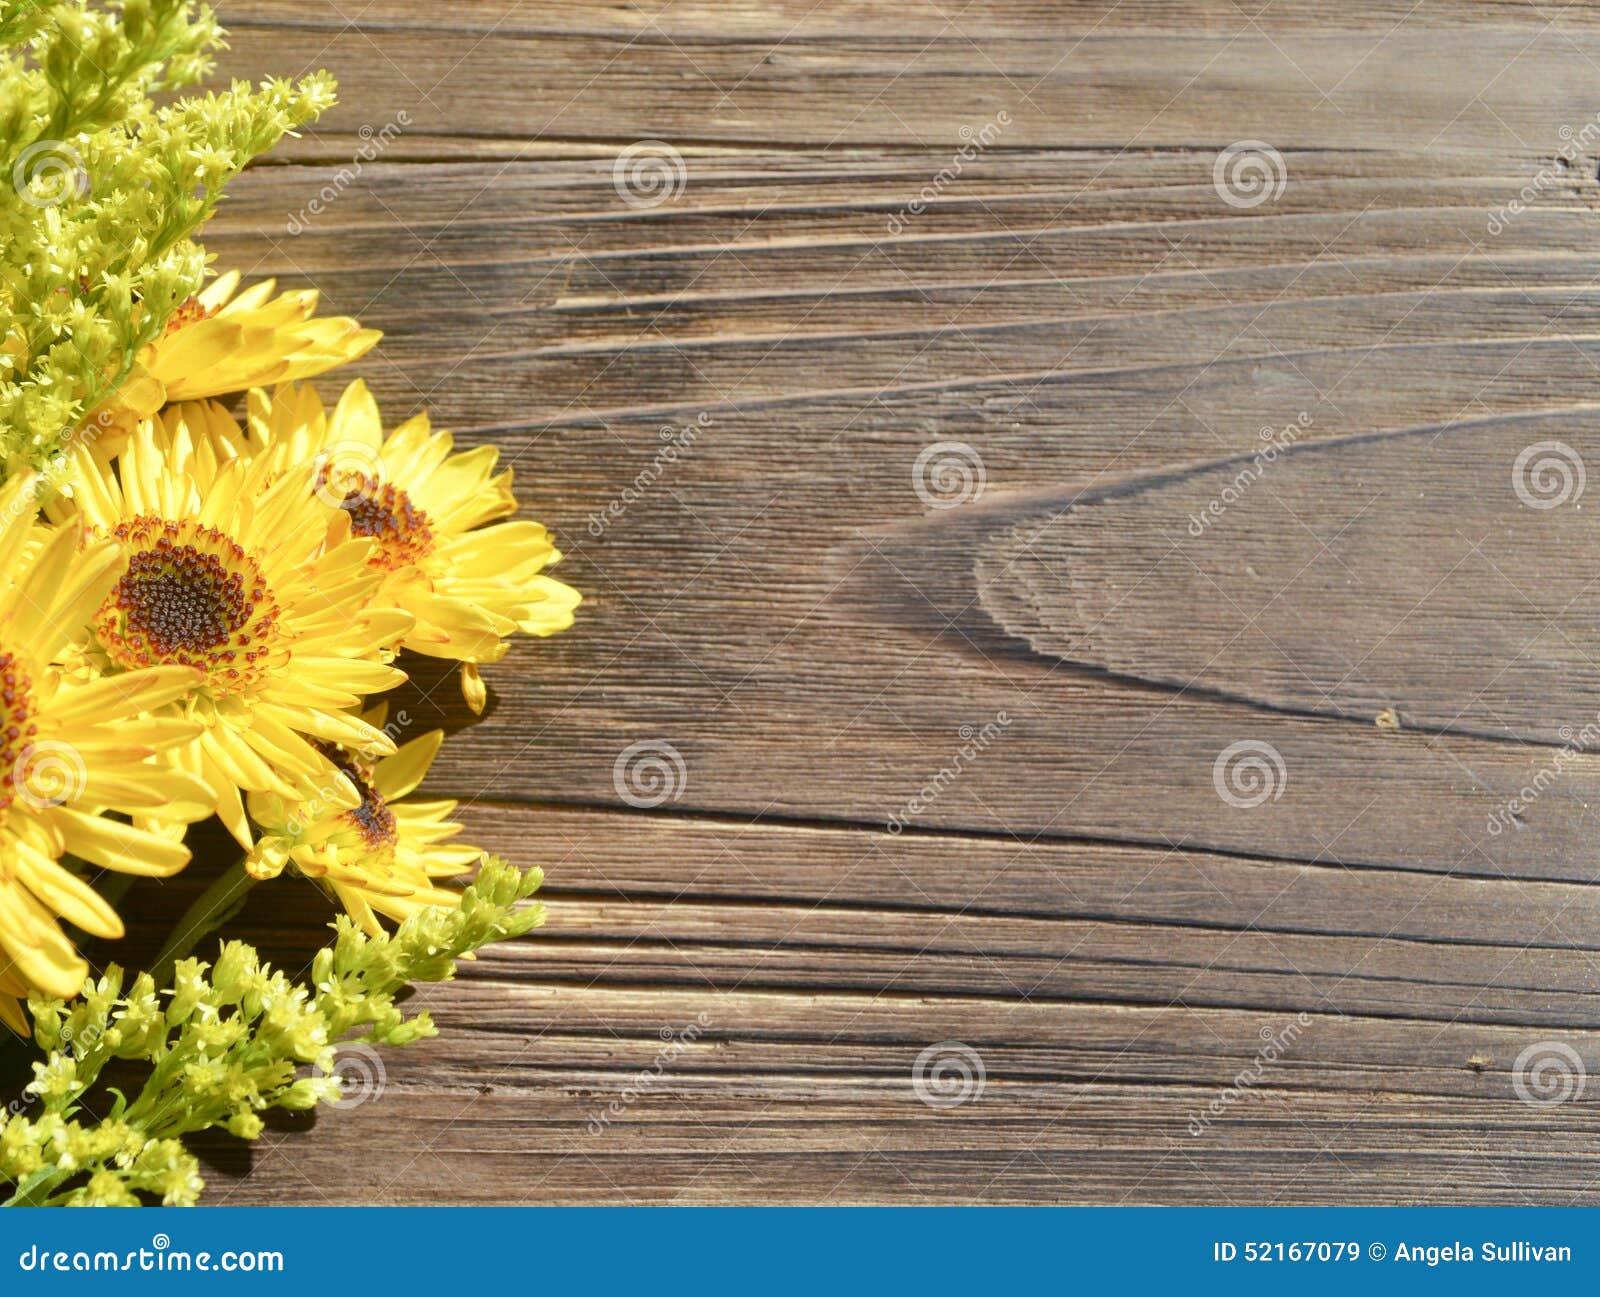 Yellow Daisies Wood Background Stock Image